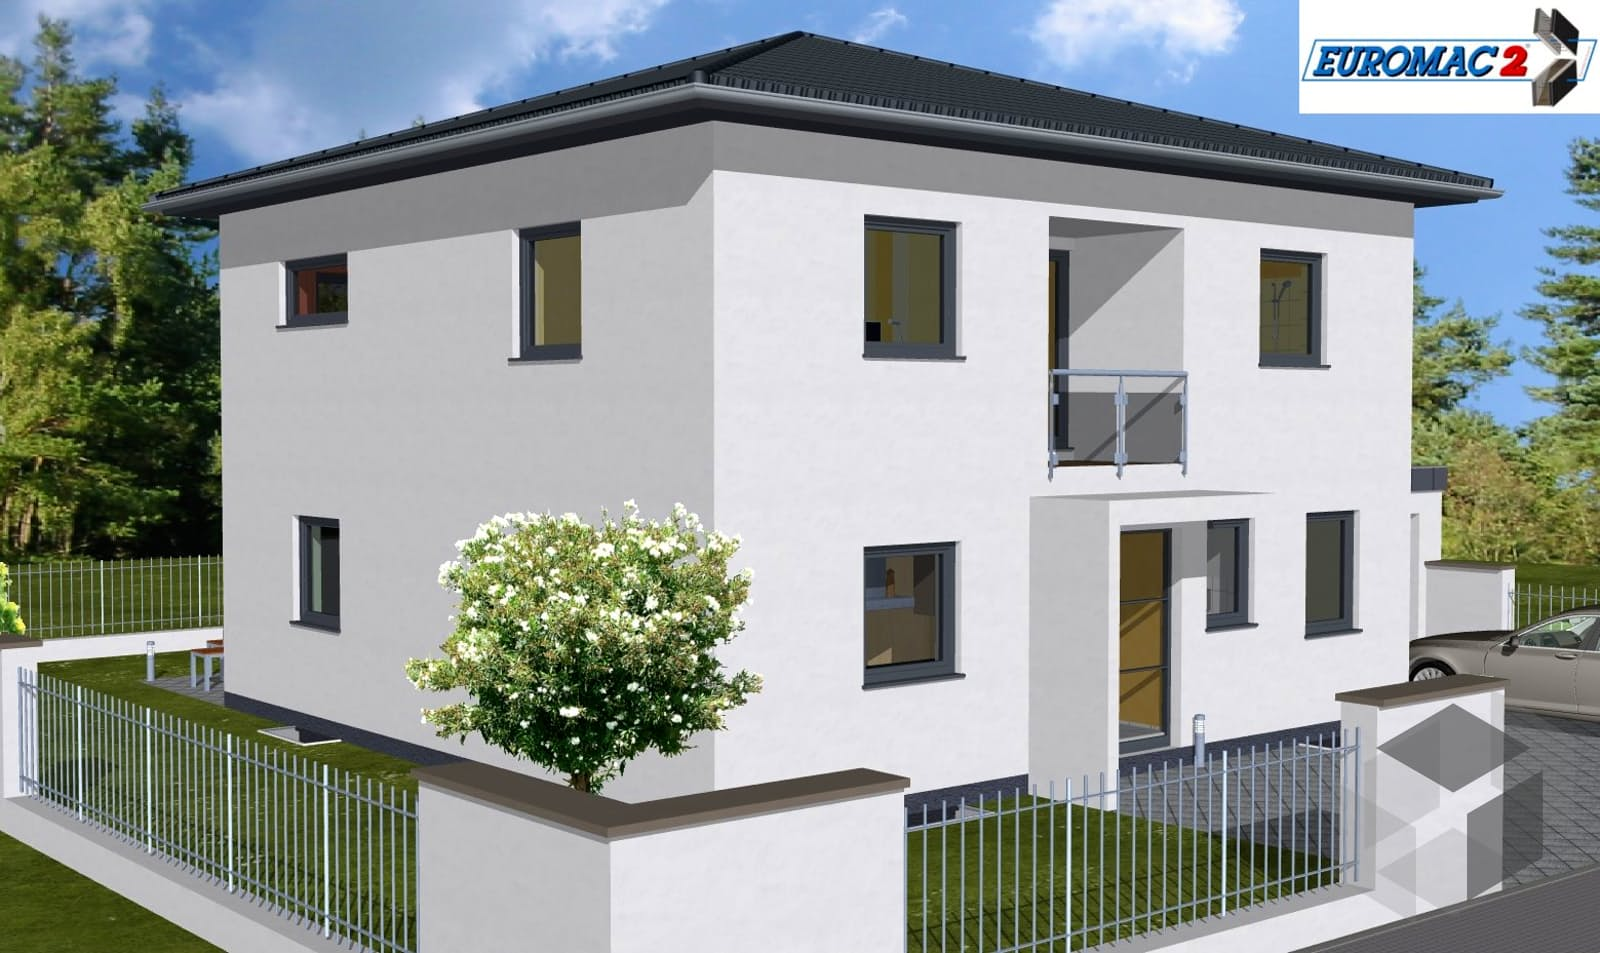 Massivhaus Bausatzhaus Bis 50 000 Hauser Anbieter